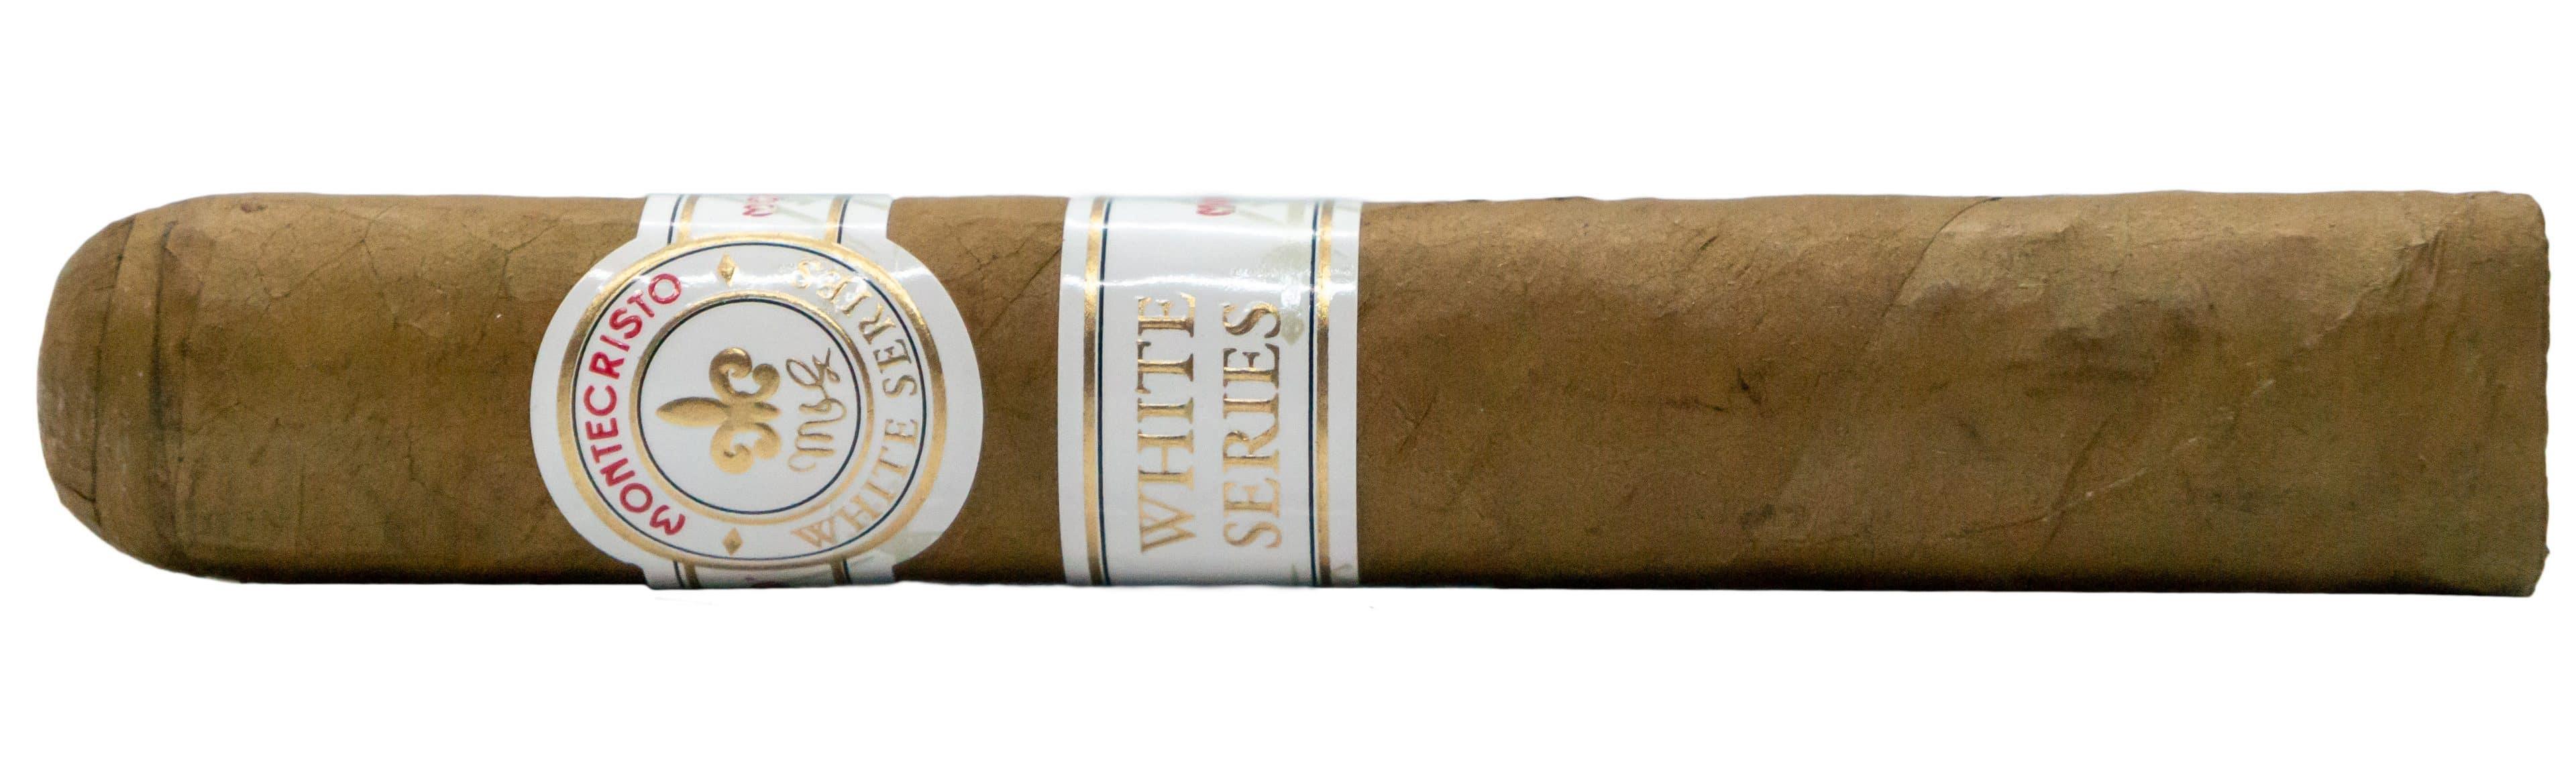 Blind Cigar Review: Montecristo   White Series Rothchilde